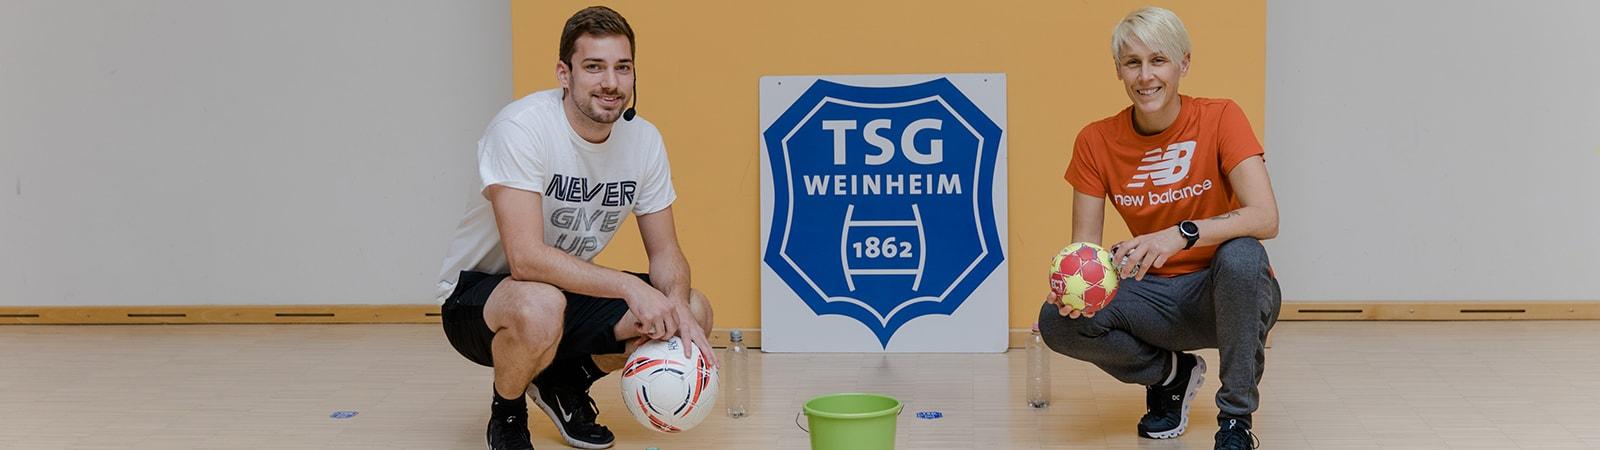 TSG Weinheim - Kindervideos Grundschule